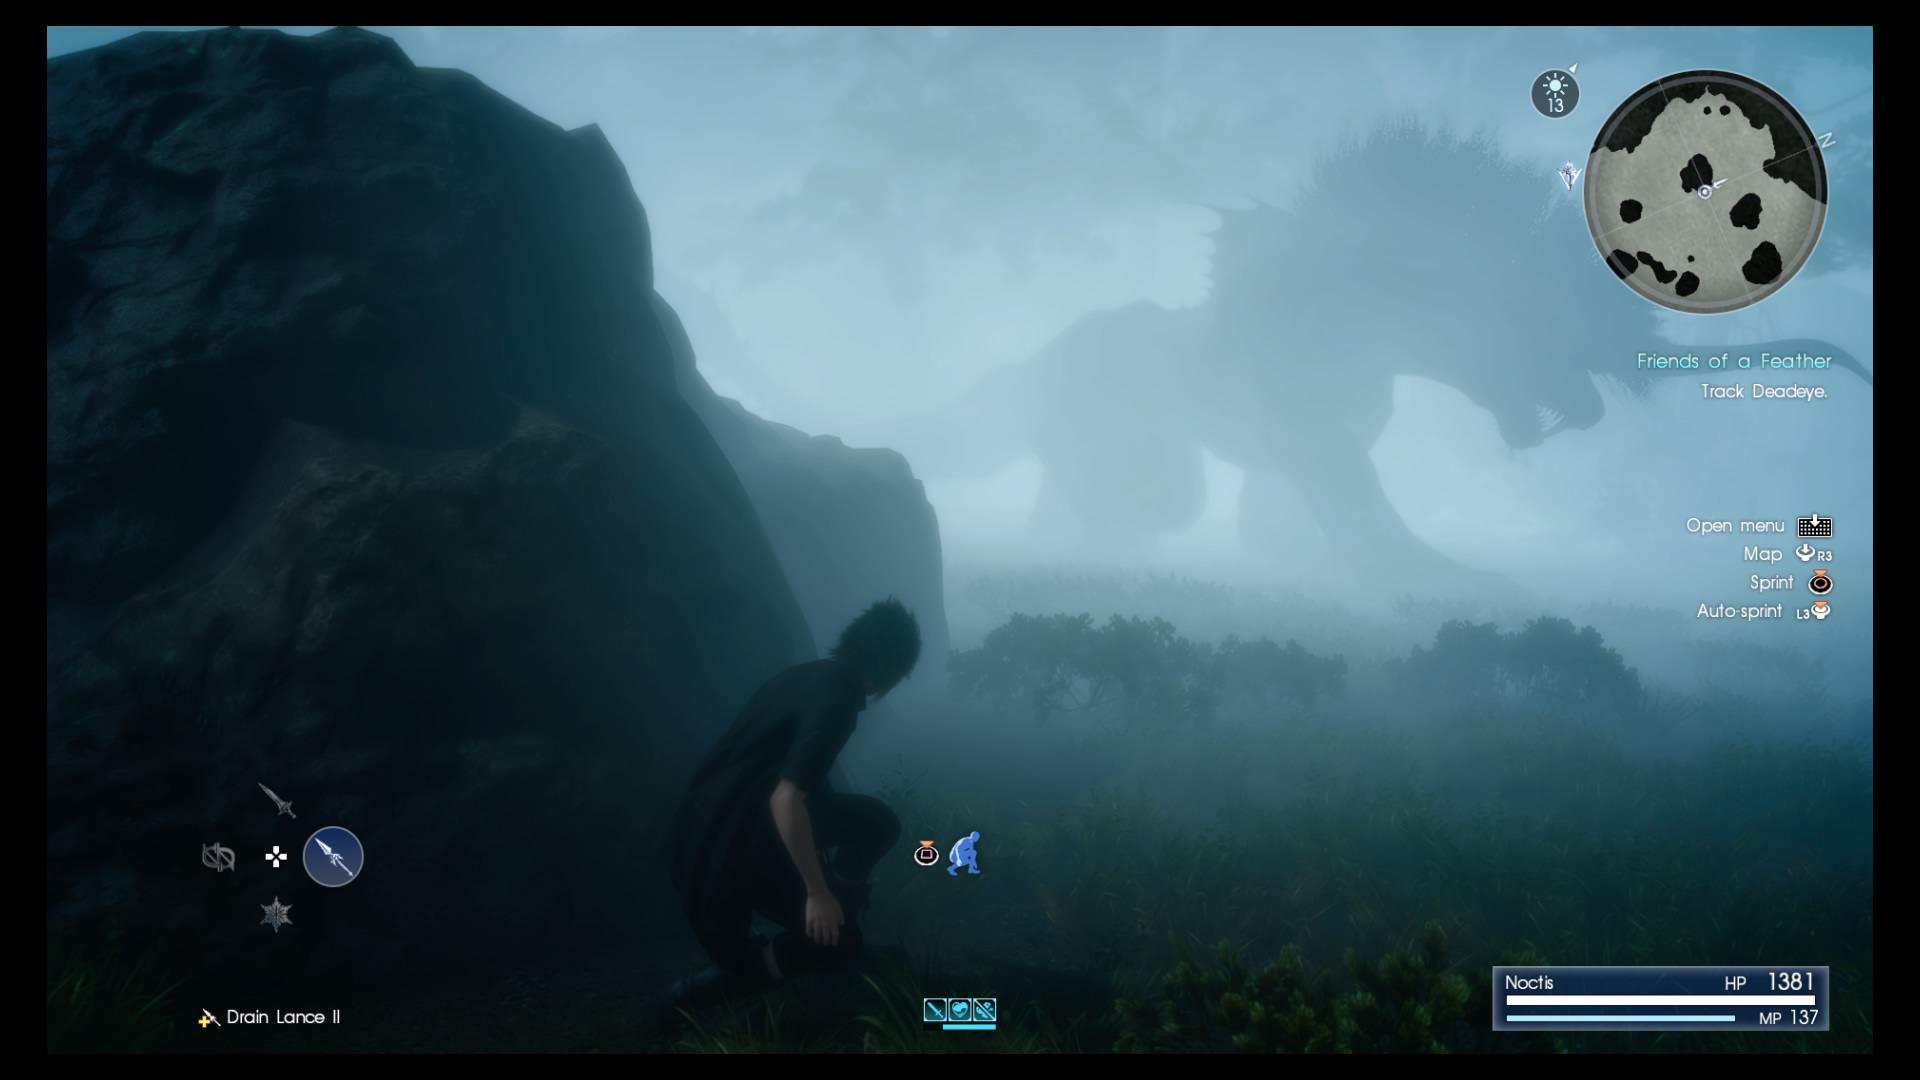 Goondu Review Final Fantasy Xv Techgoondu Deluxe Edition Region 3 Ffxvs Fantastic Beasts Makes One Stare In Awe Screenshot Yap Hui Bin